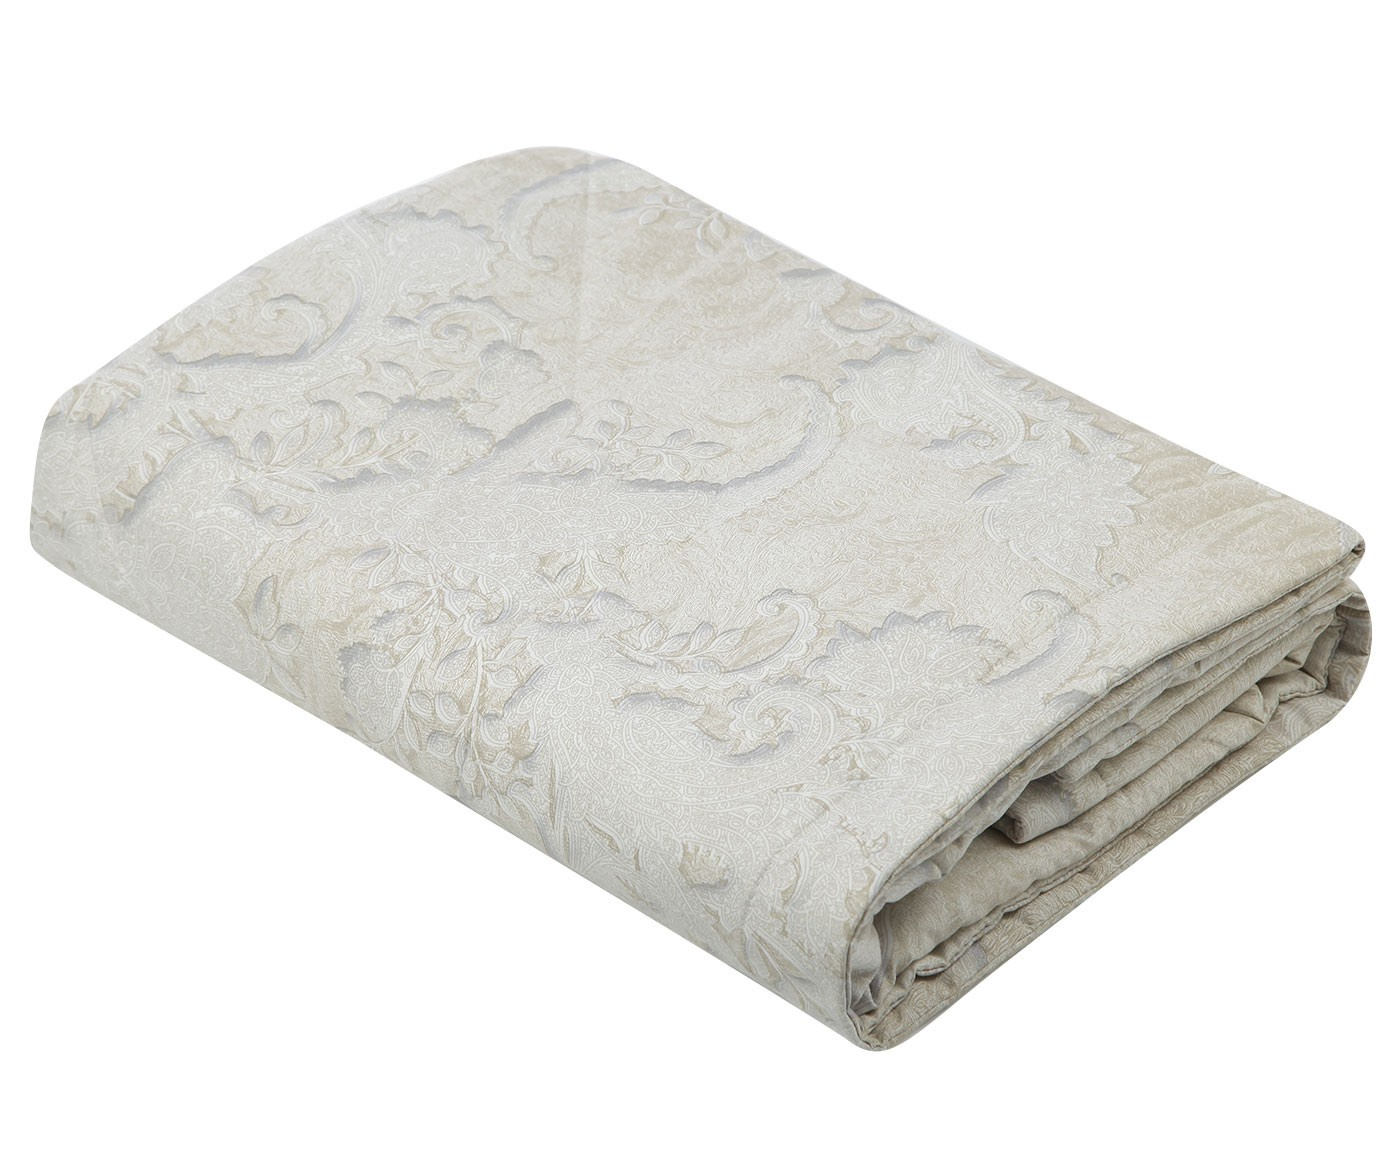 цена Одеяло Pastel 18941031, бежевый онлайн в 2017 году